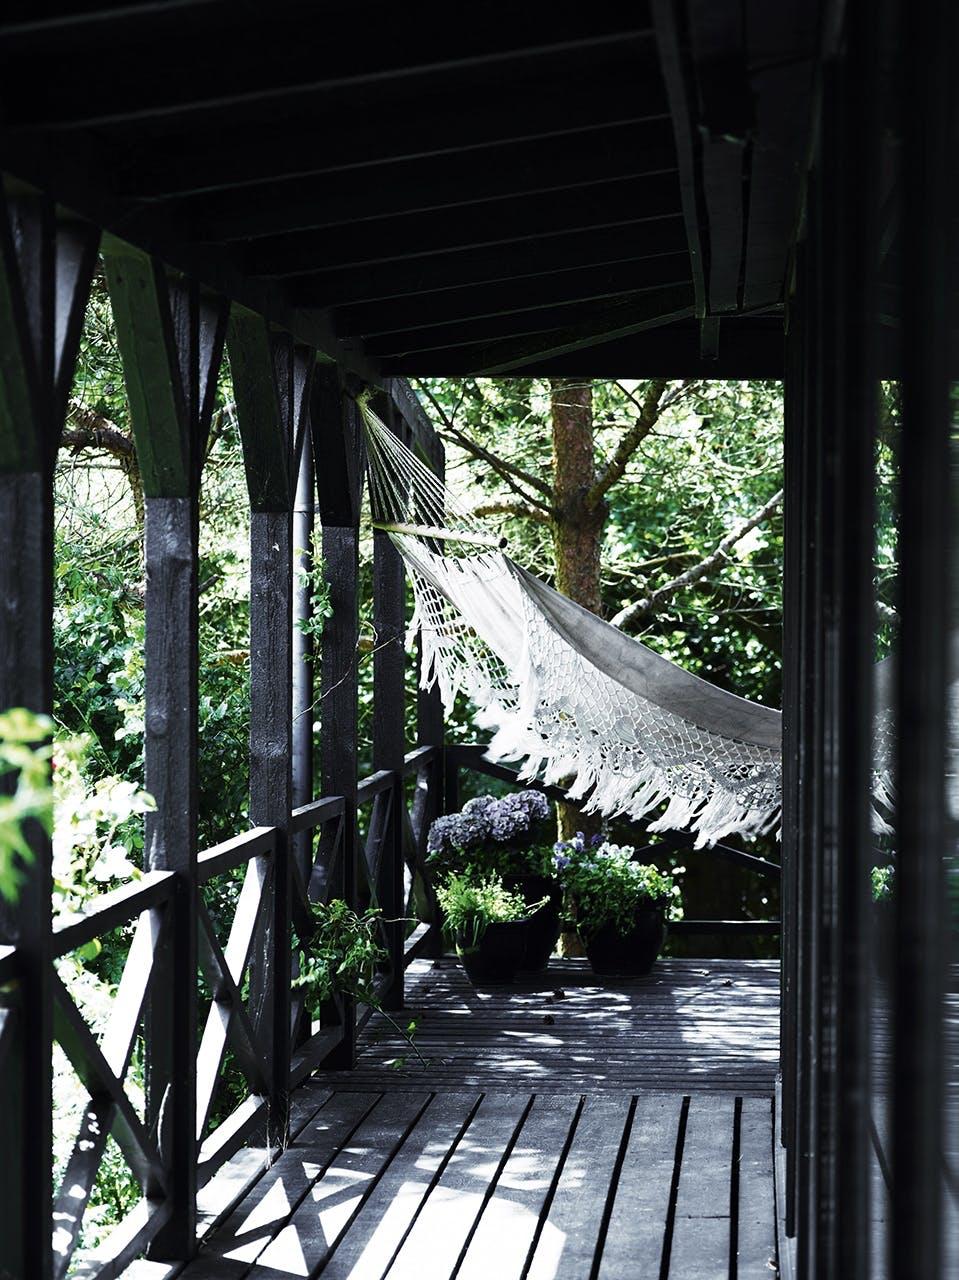 tisvilde sommerhus terrasse hængekøje